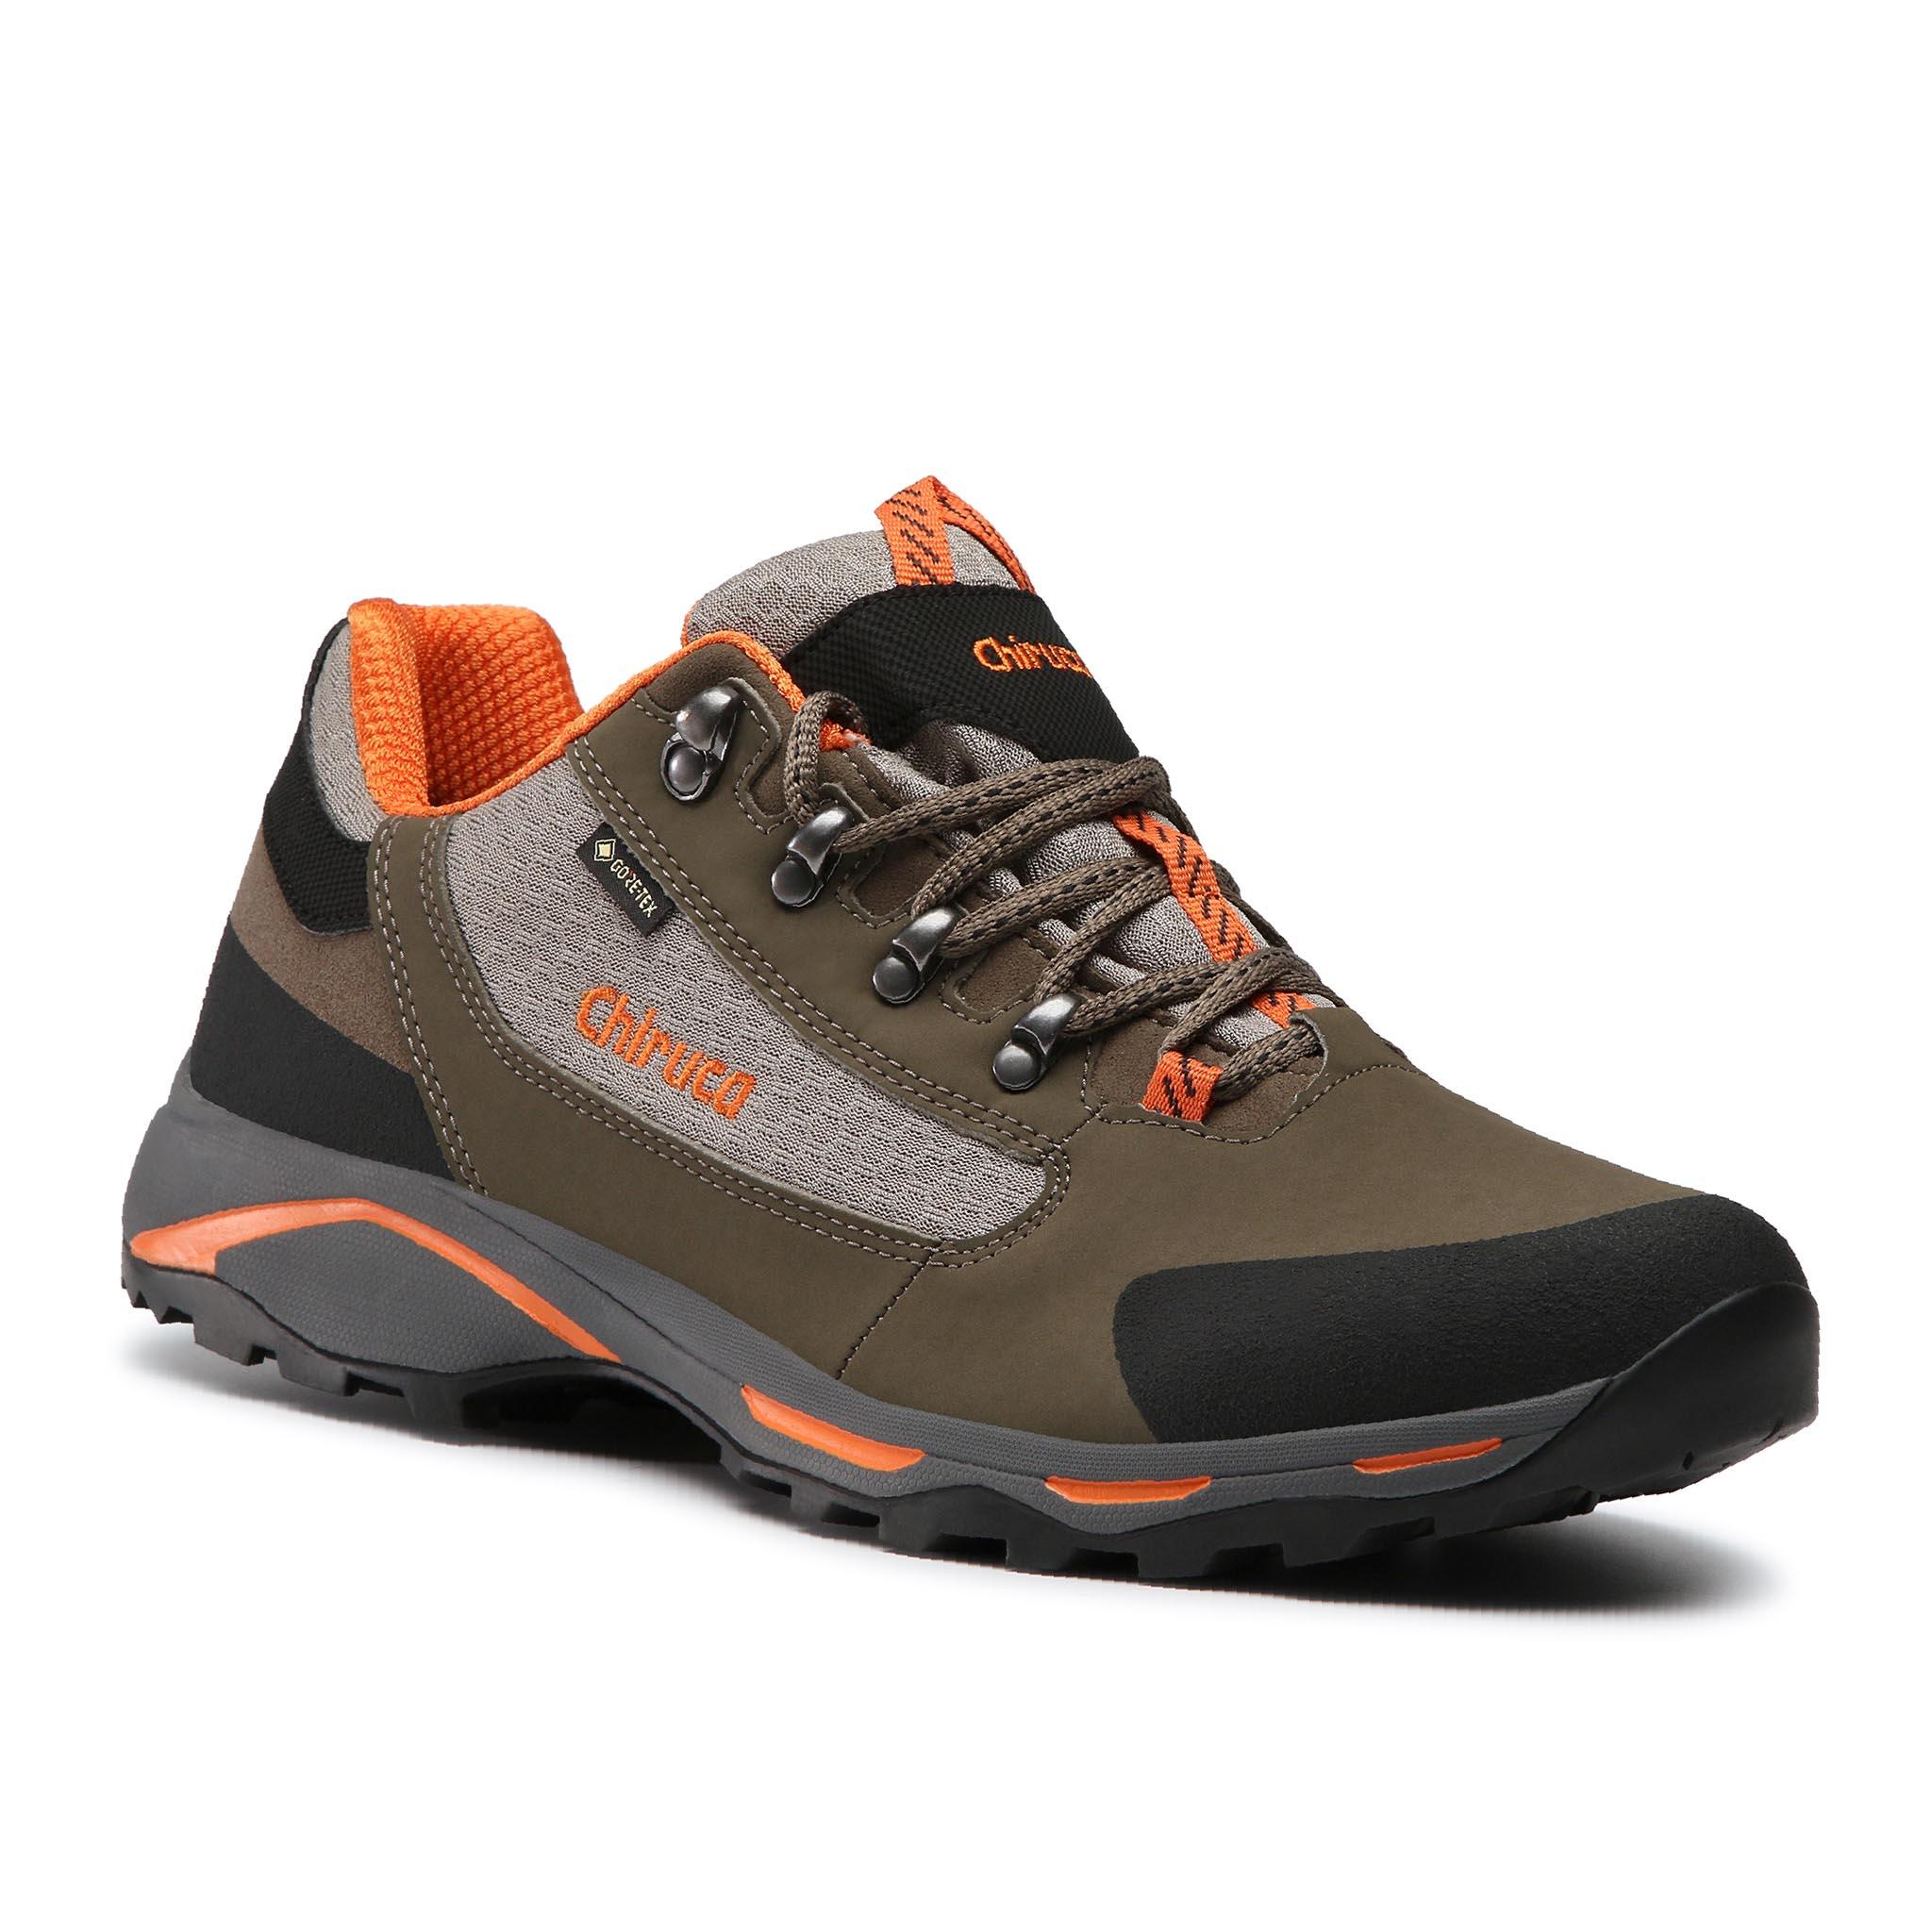 Trekingová obuv CHIRUCA - Santiago 08 GORE-TEX 4489308 Marron/Naranja